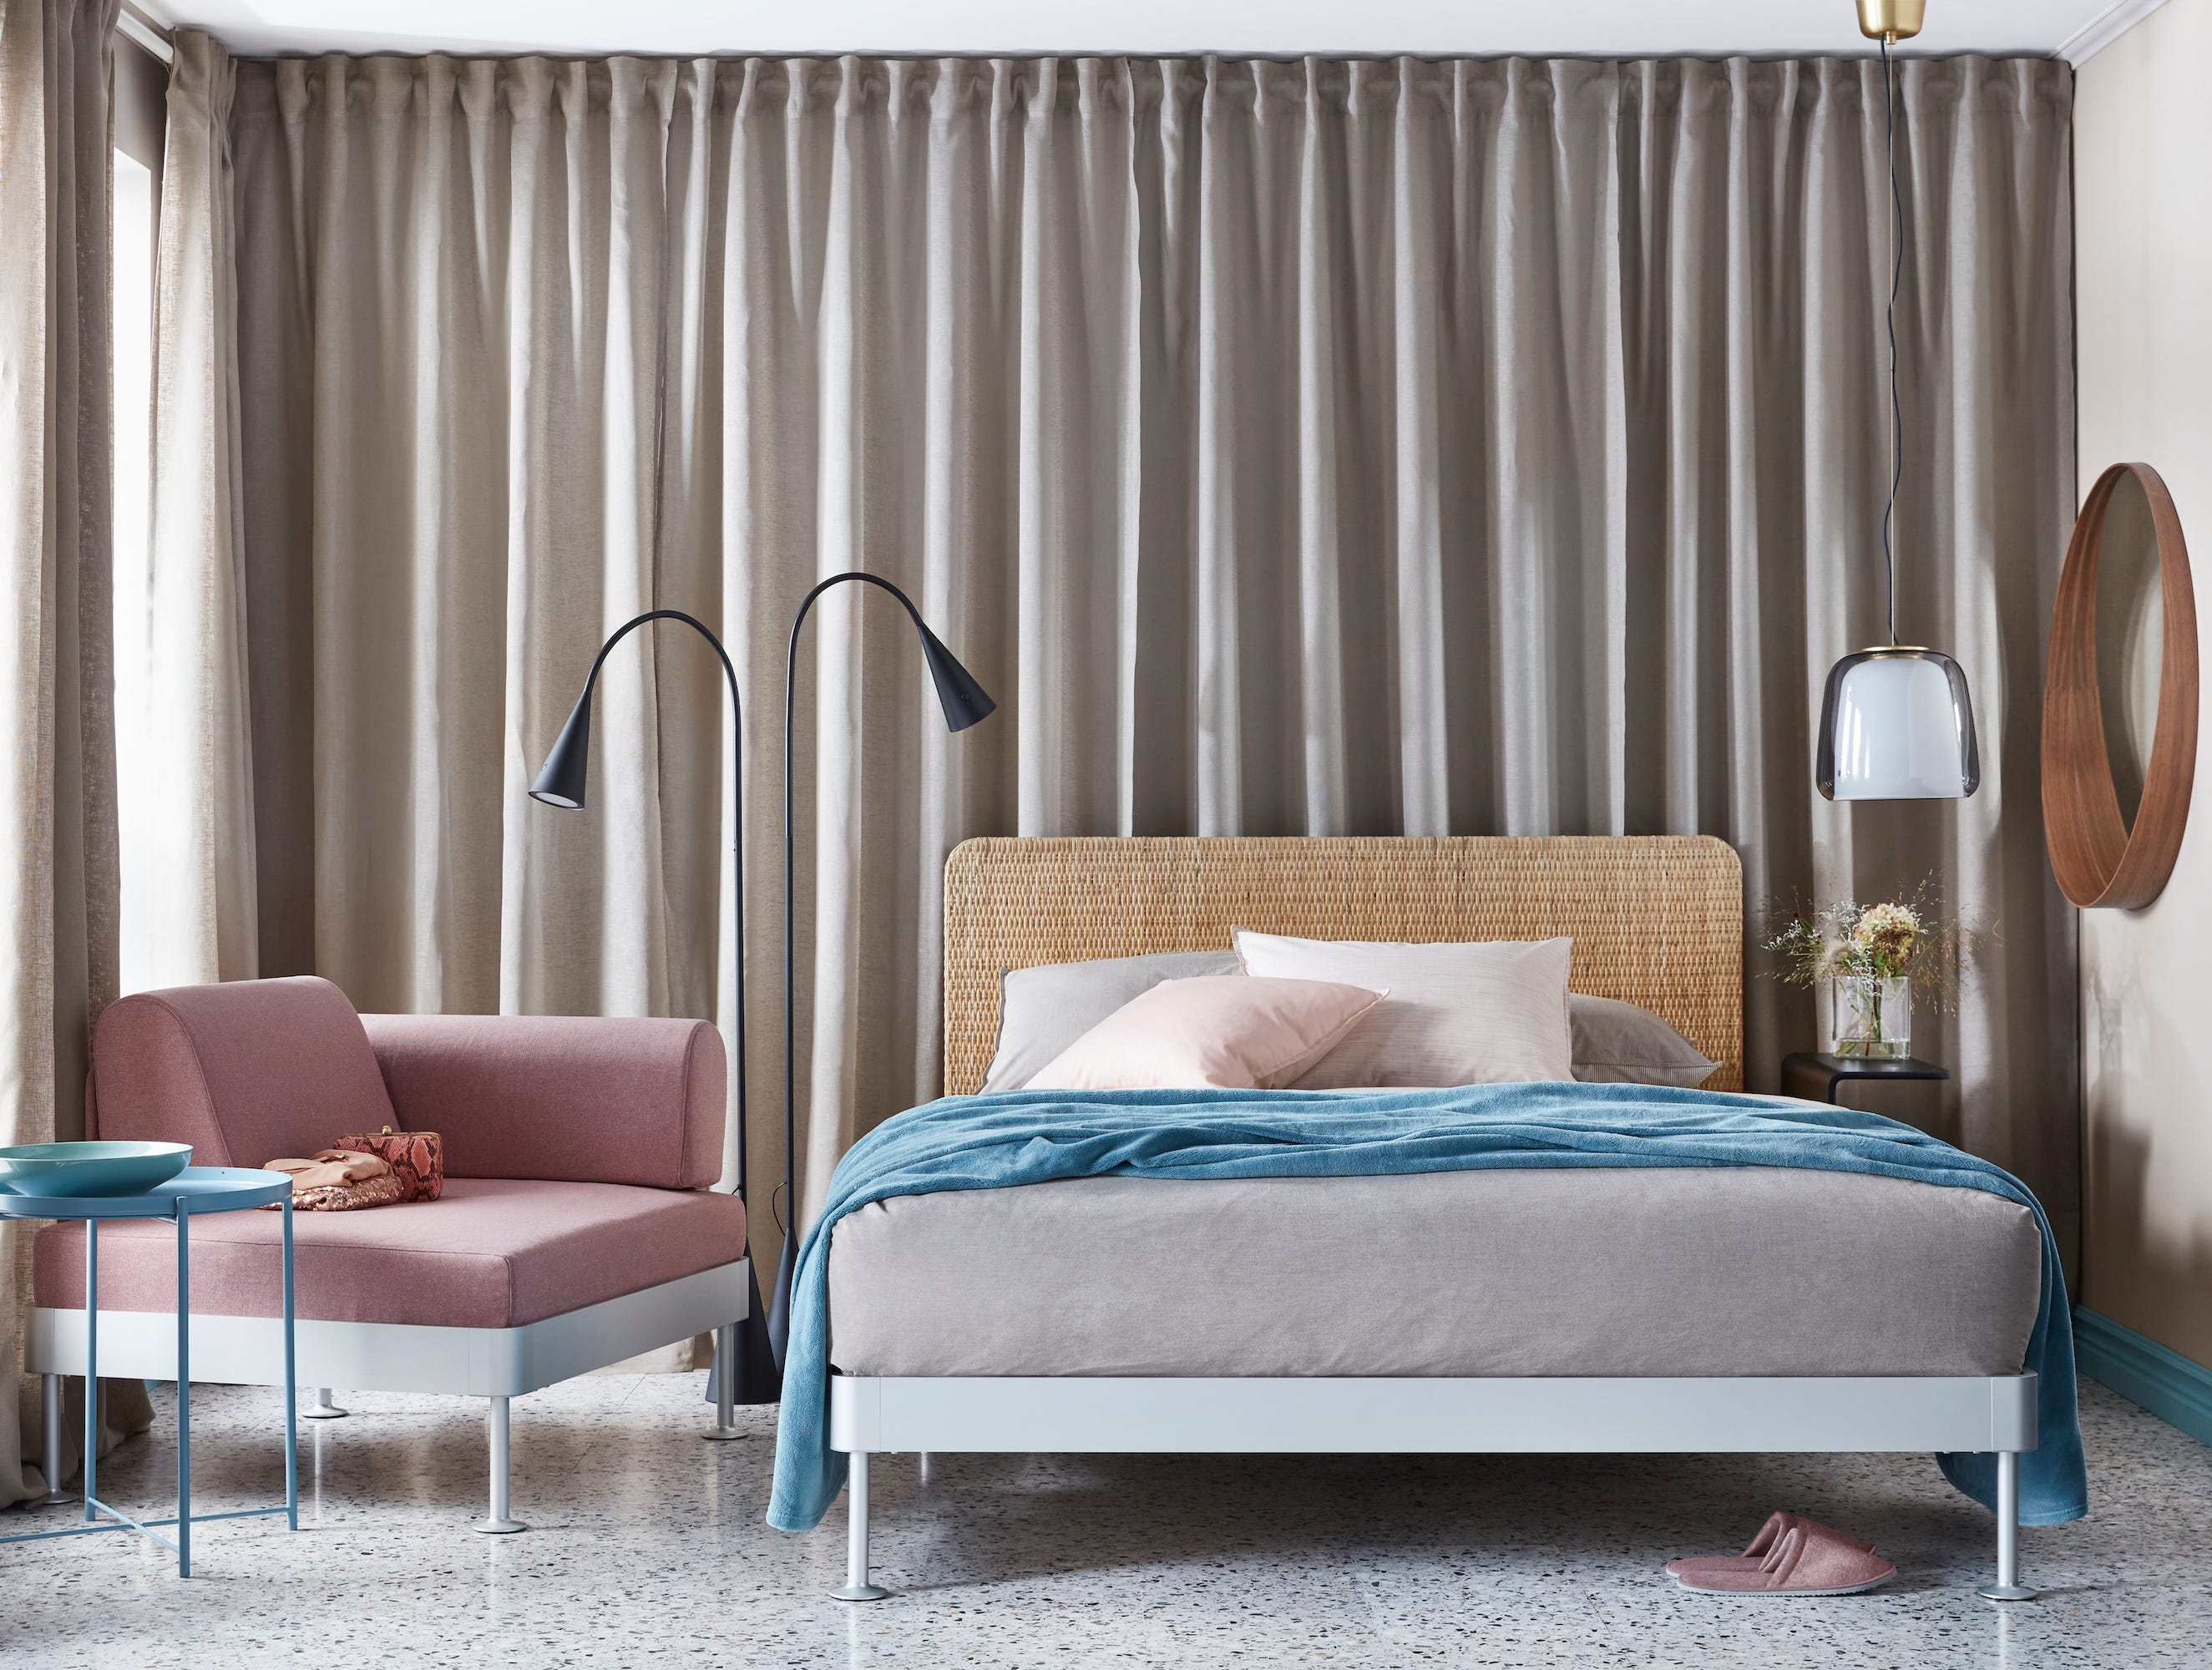 Ikea And Tom Dixon Release Delaktig Customizable Bed befa2d9ac